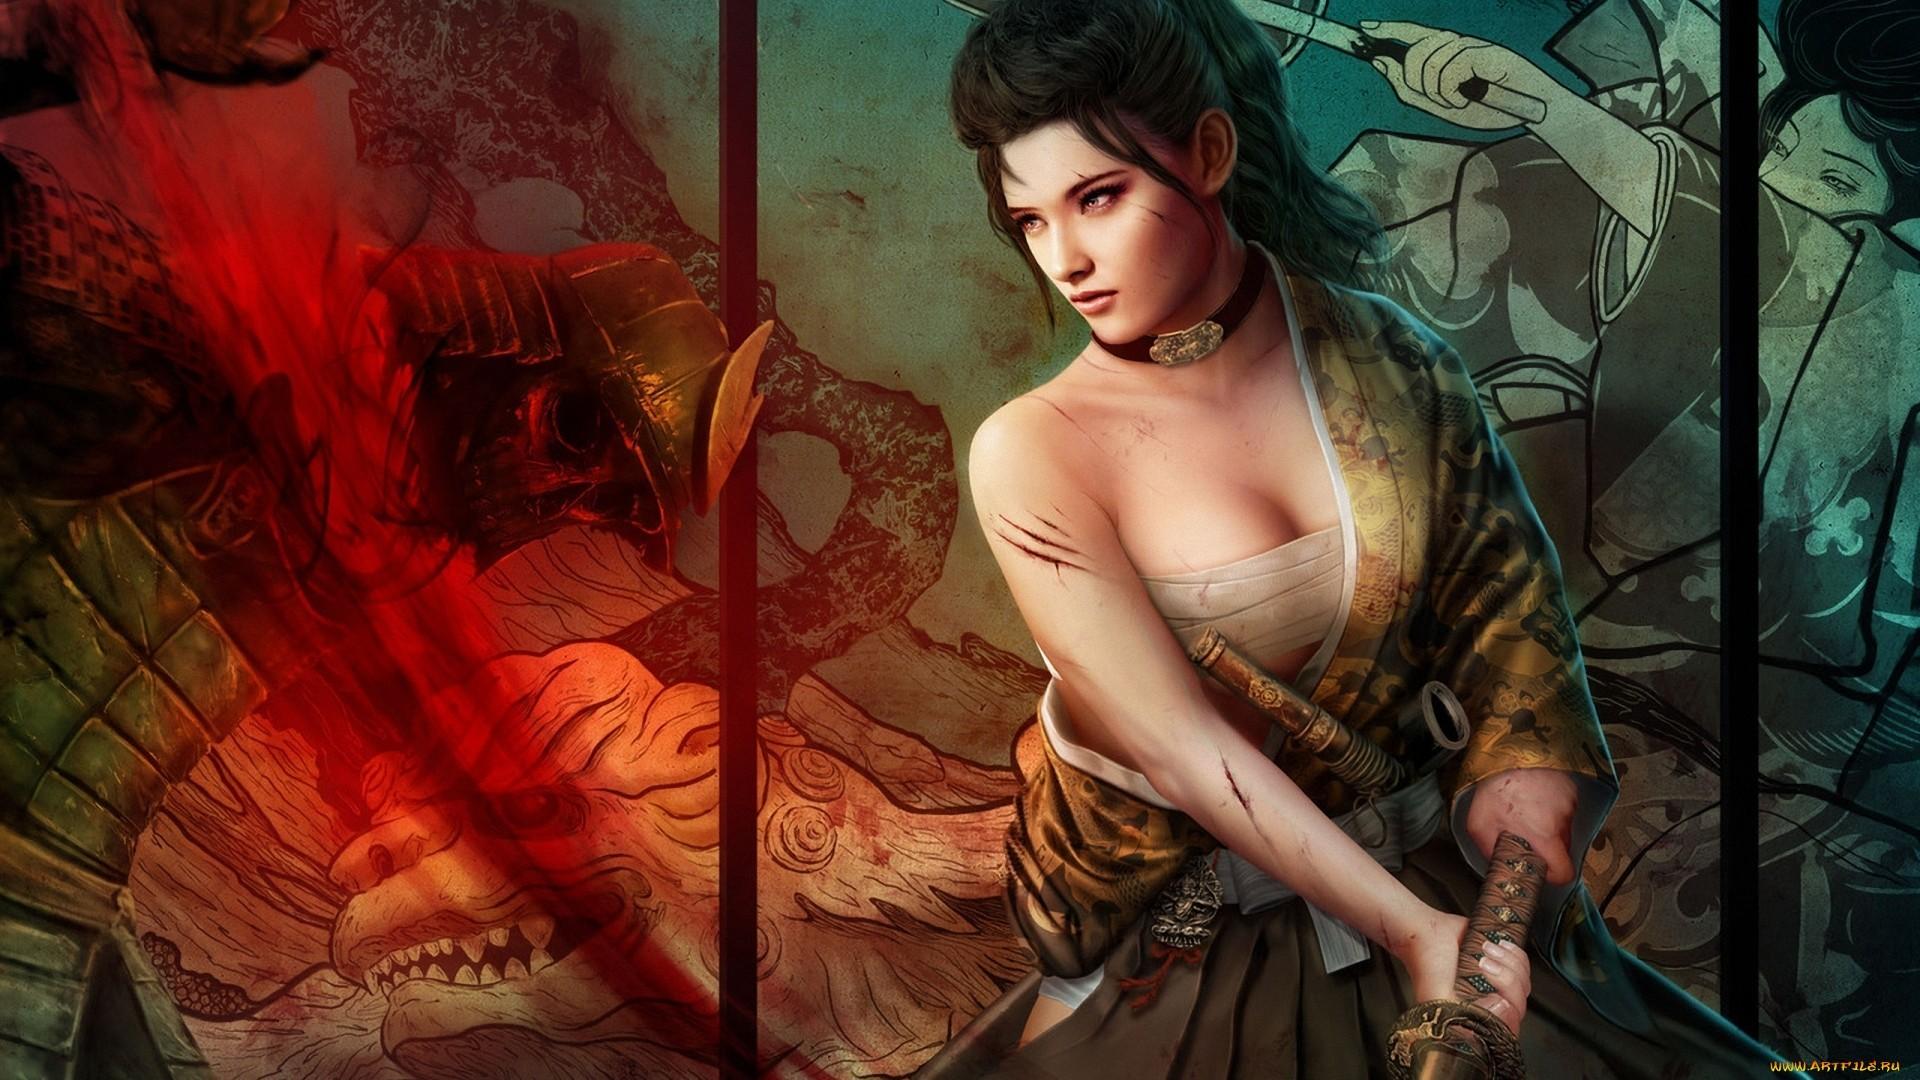 Fantasy Art Women Females Girls Warrior Weapons Blood Dragons .